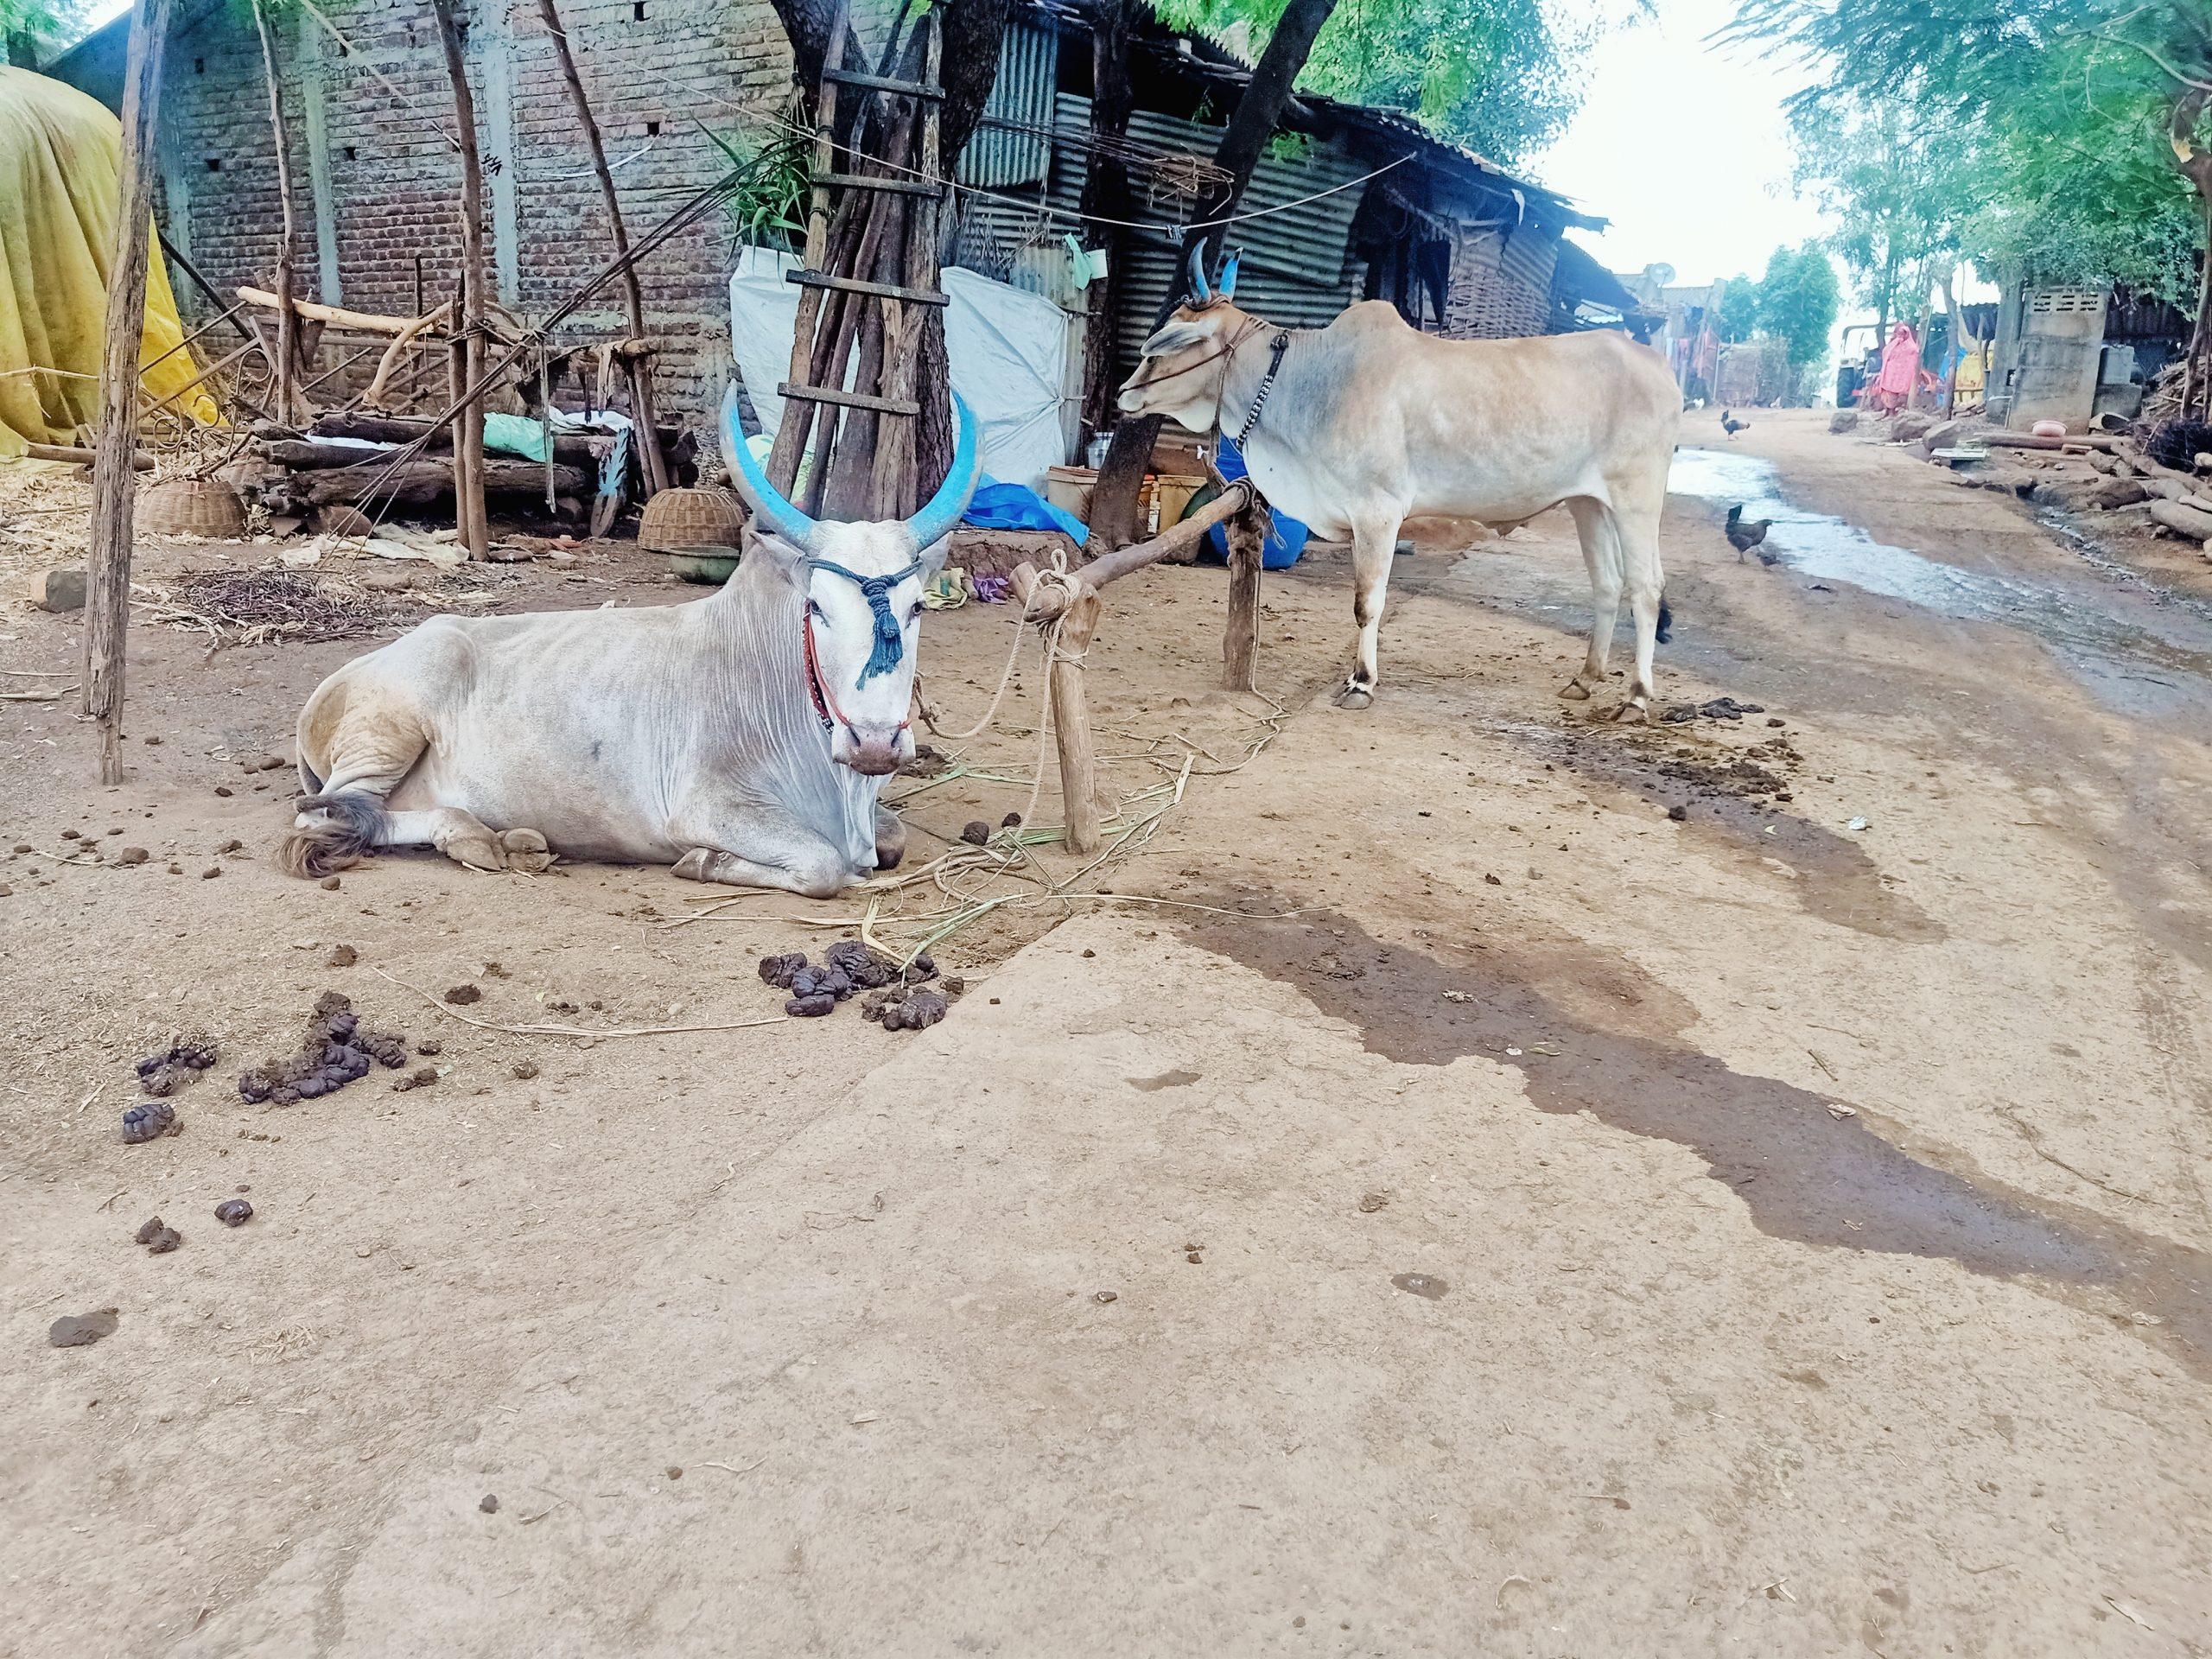 Oxen tied in a village